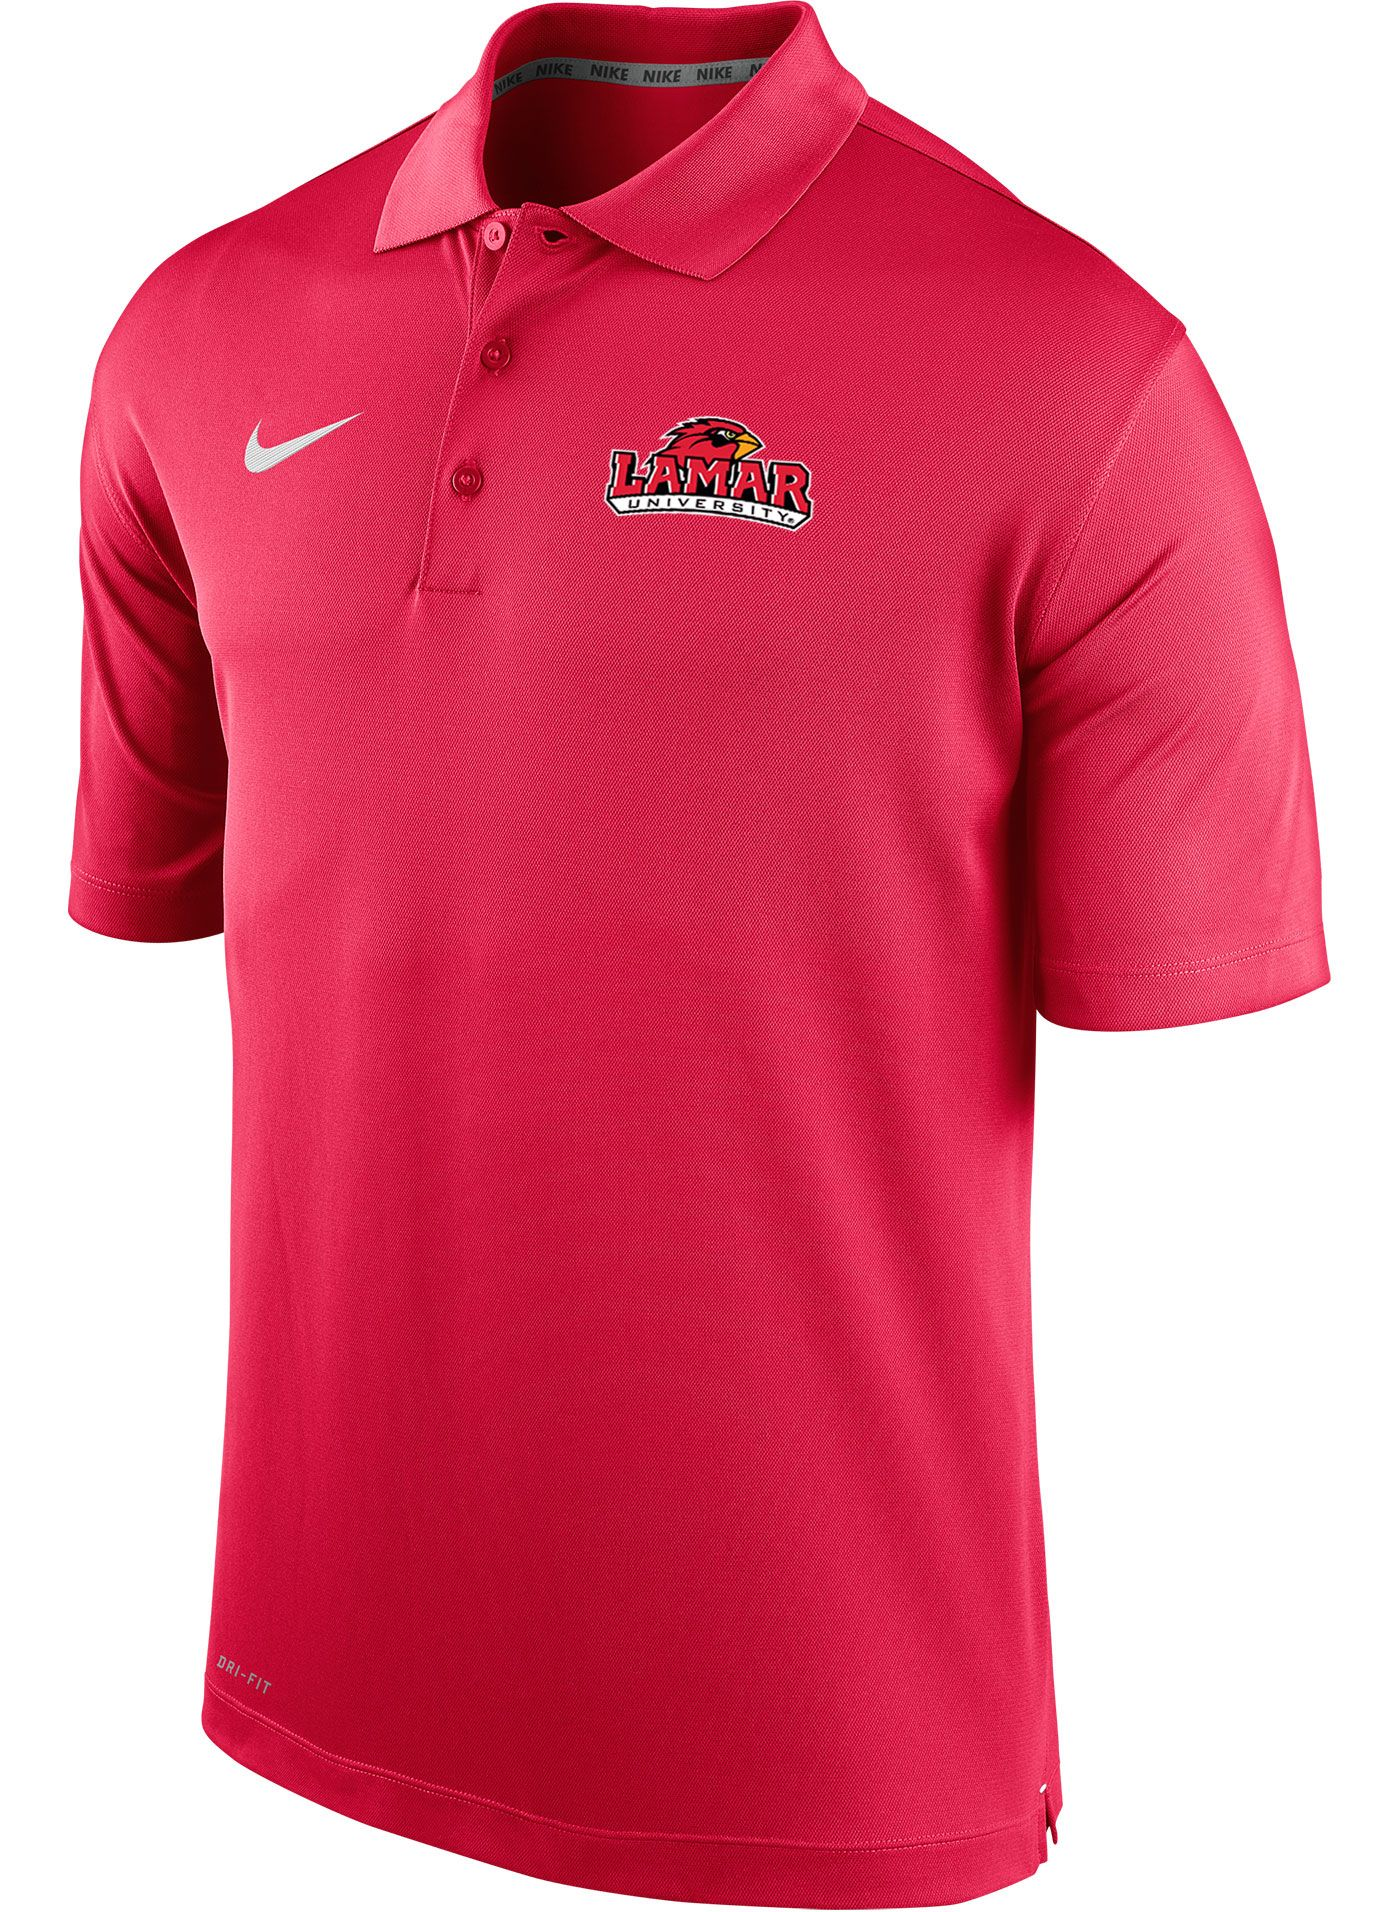 Nike Men's Lamar Cardinals Red Varsity Polo